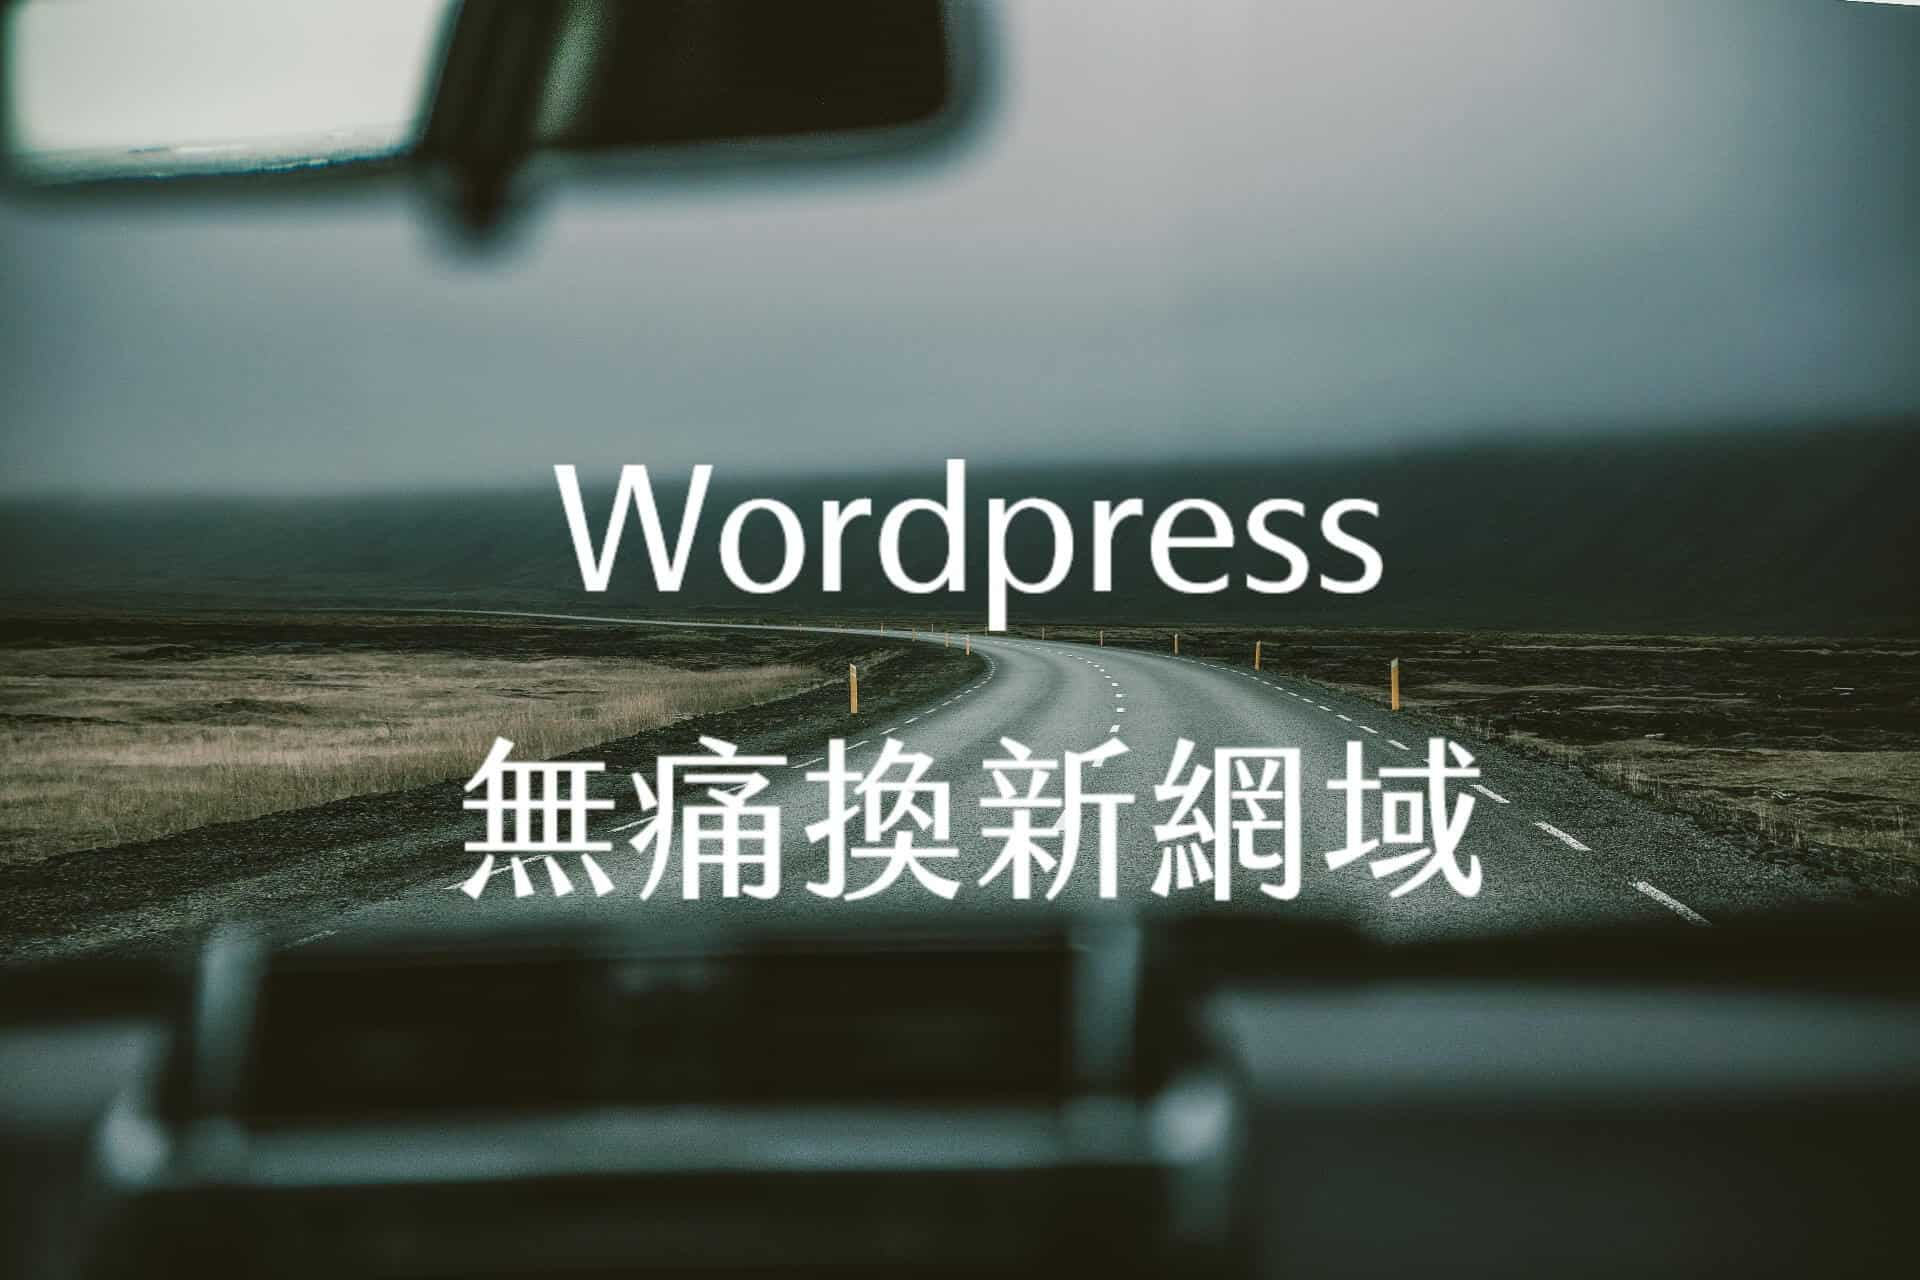 【WordPress】換網址無痛轉移 1